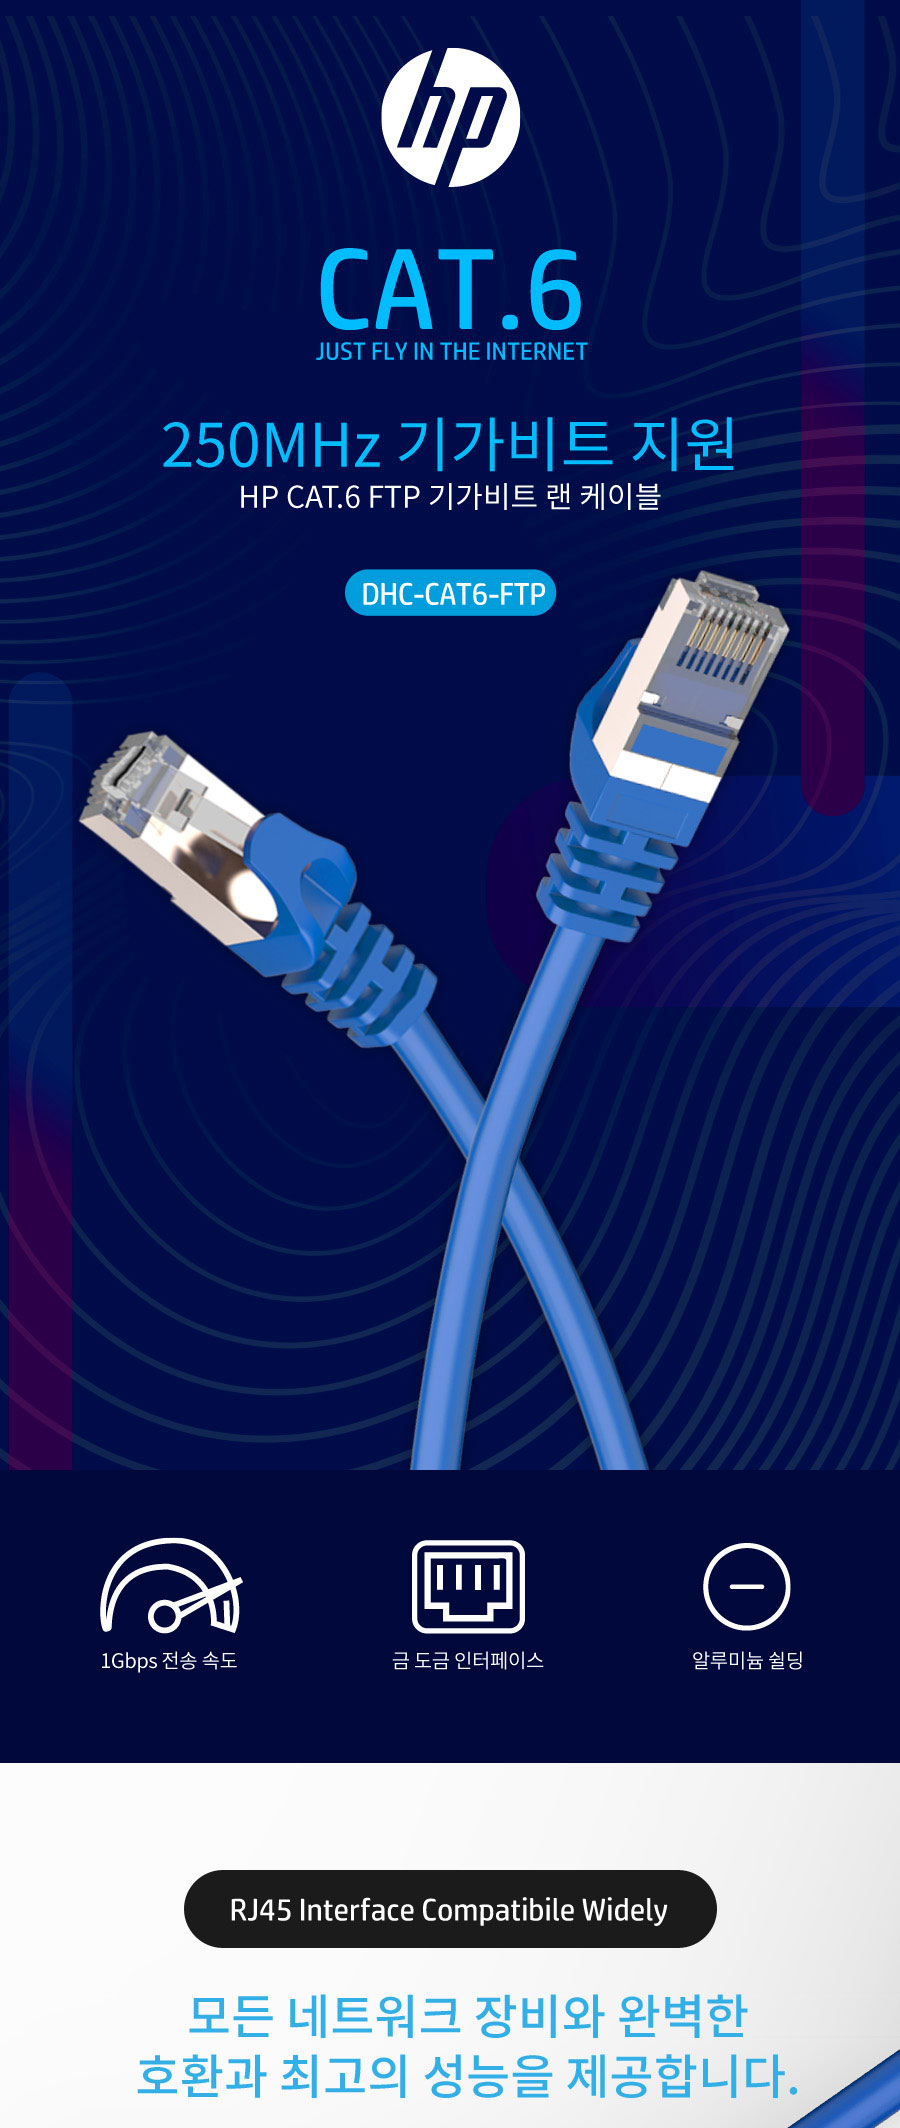 HP DHC-CAT6-FTP CAT.6 FTP 랜케이블 (3m)